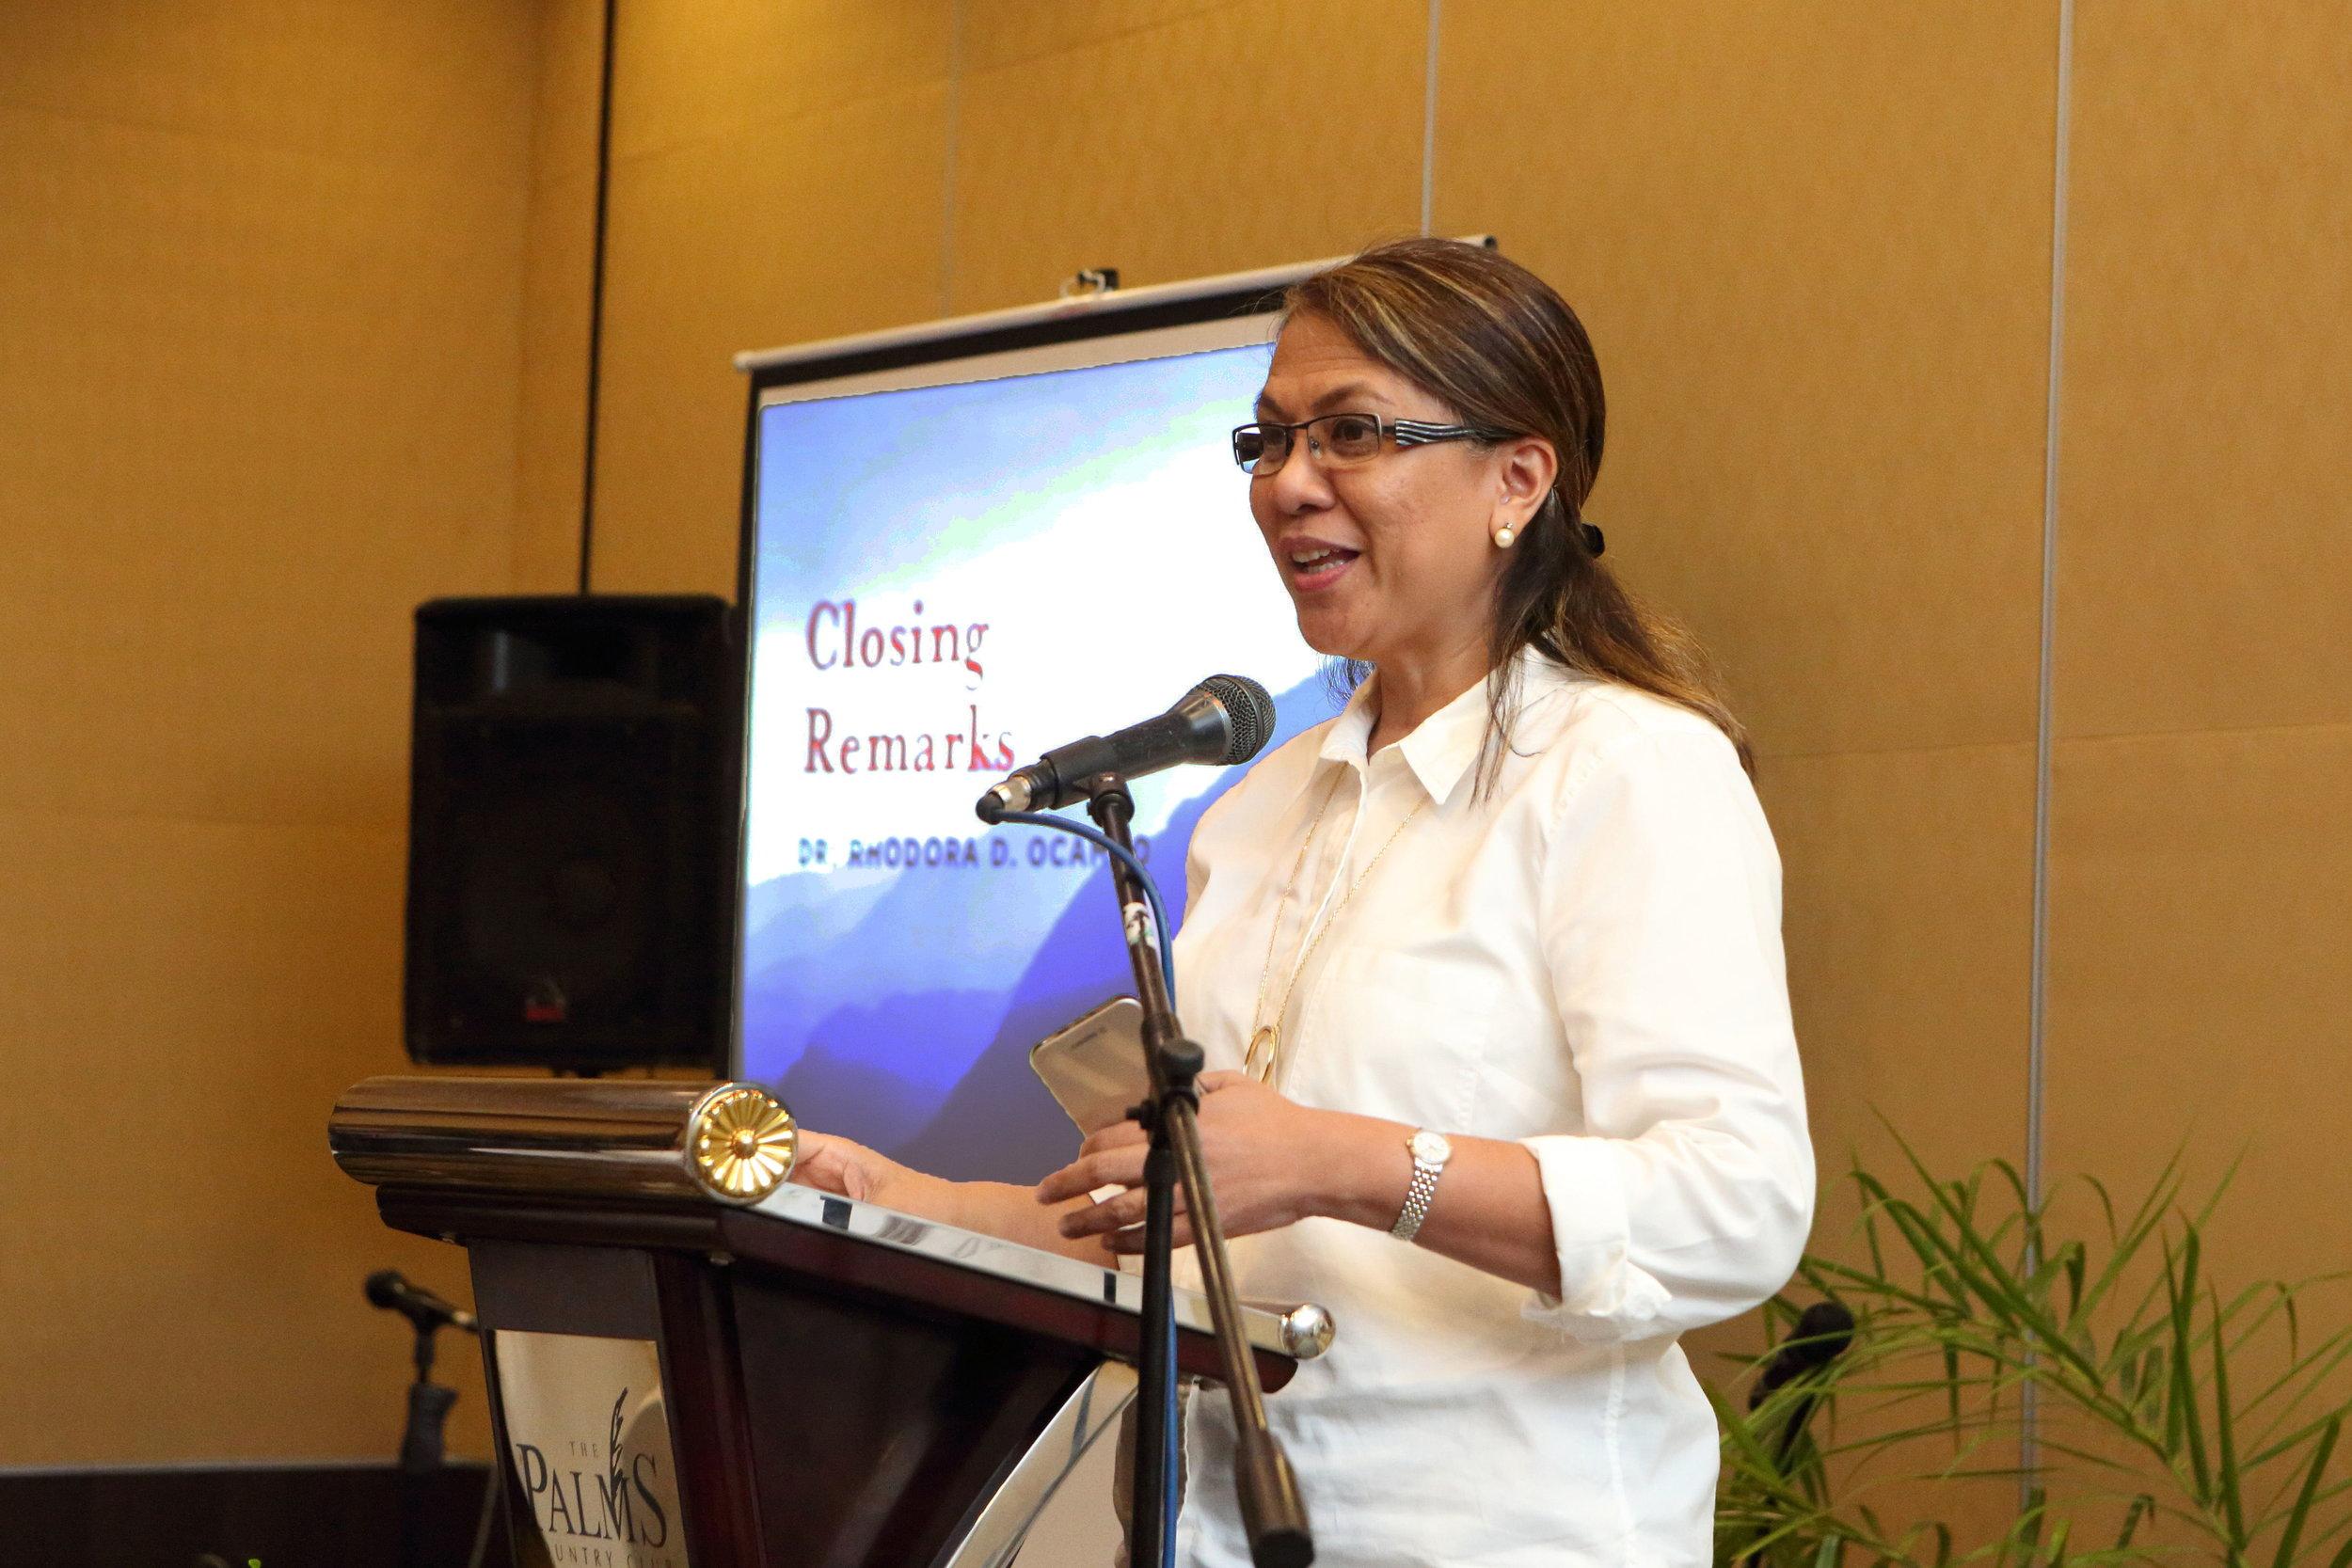 Closing remarks by Dr. Rhodora Ocampo